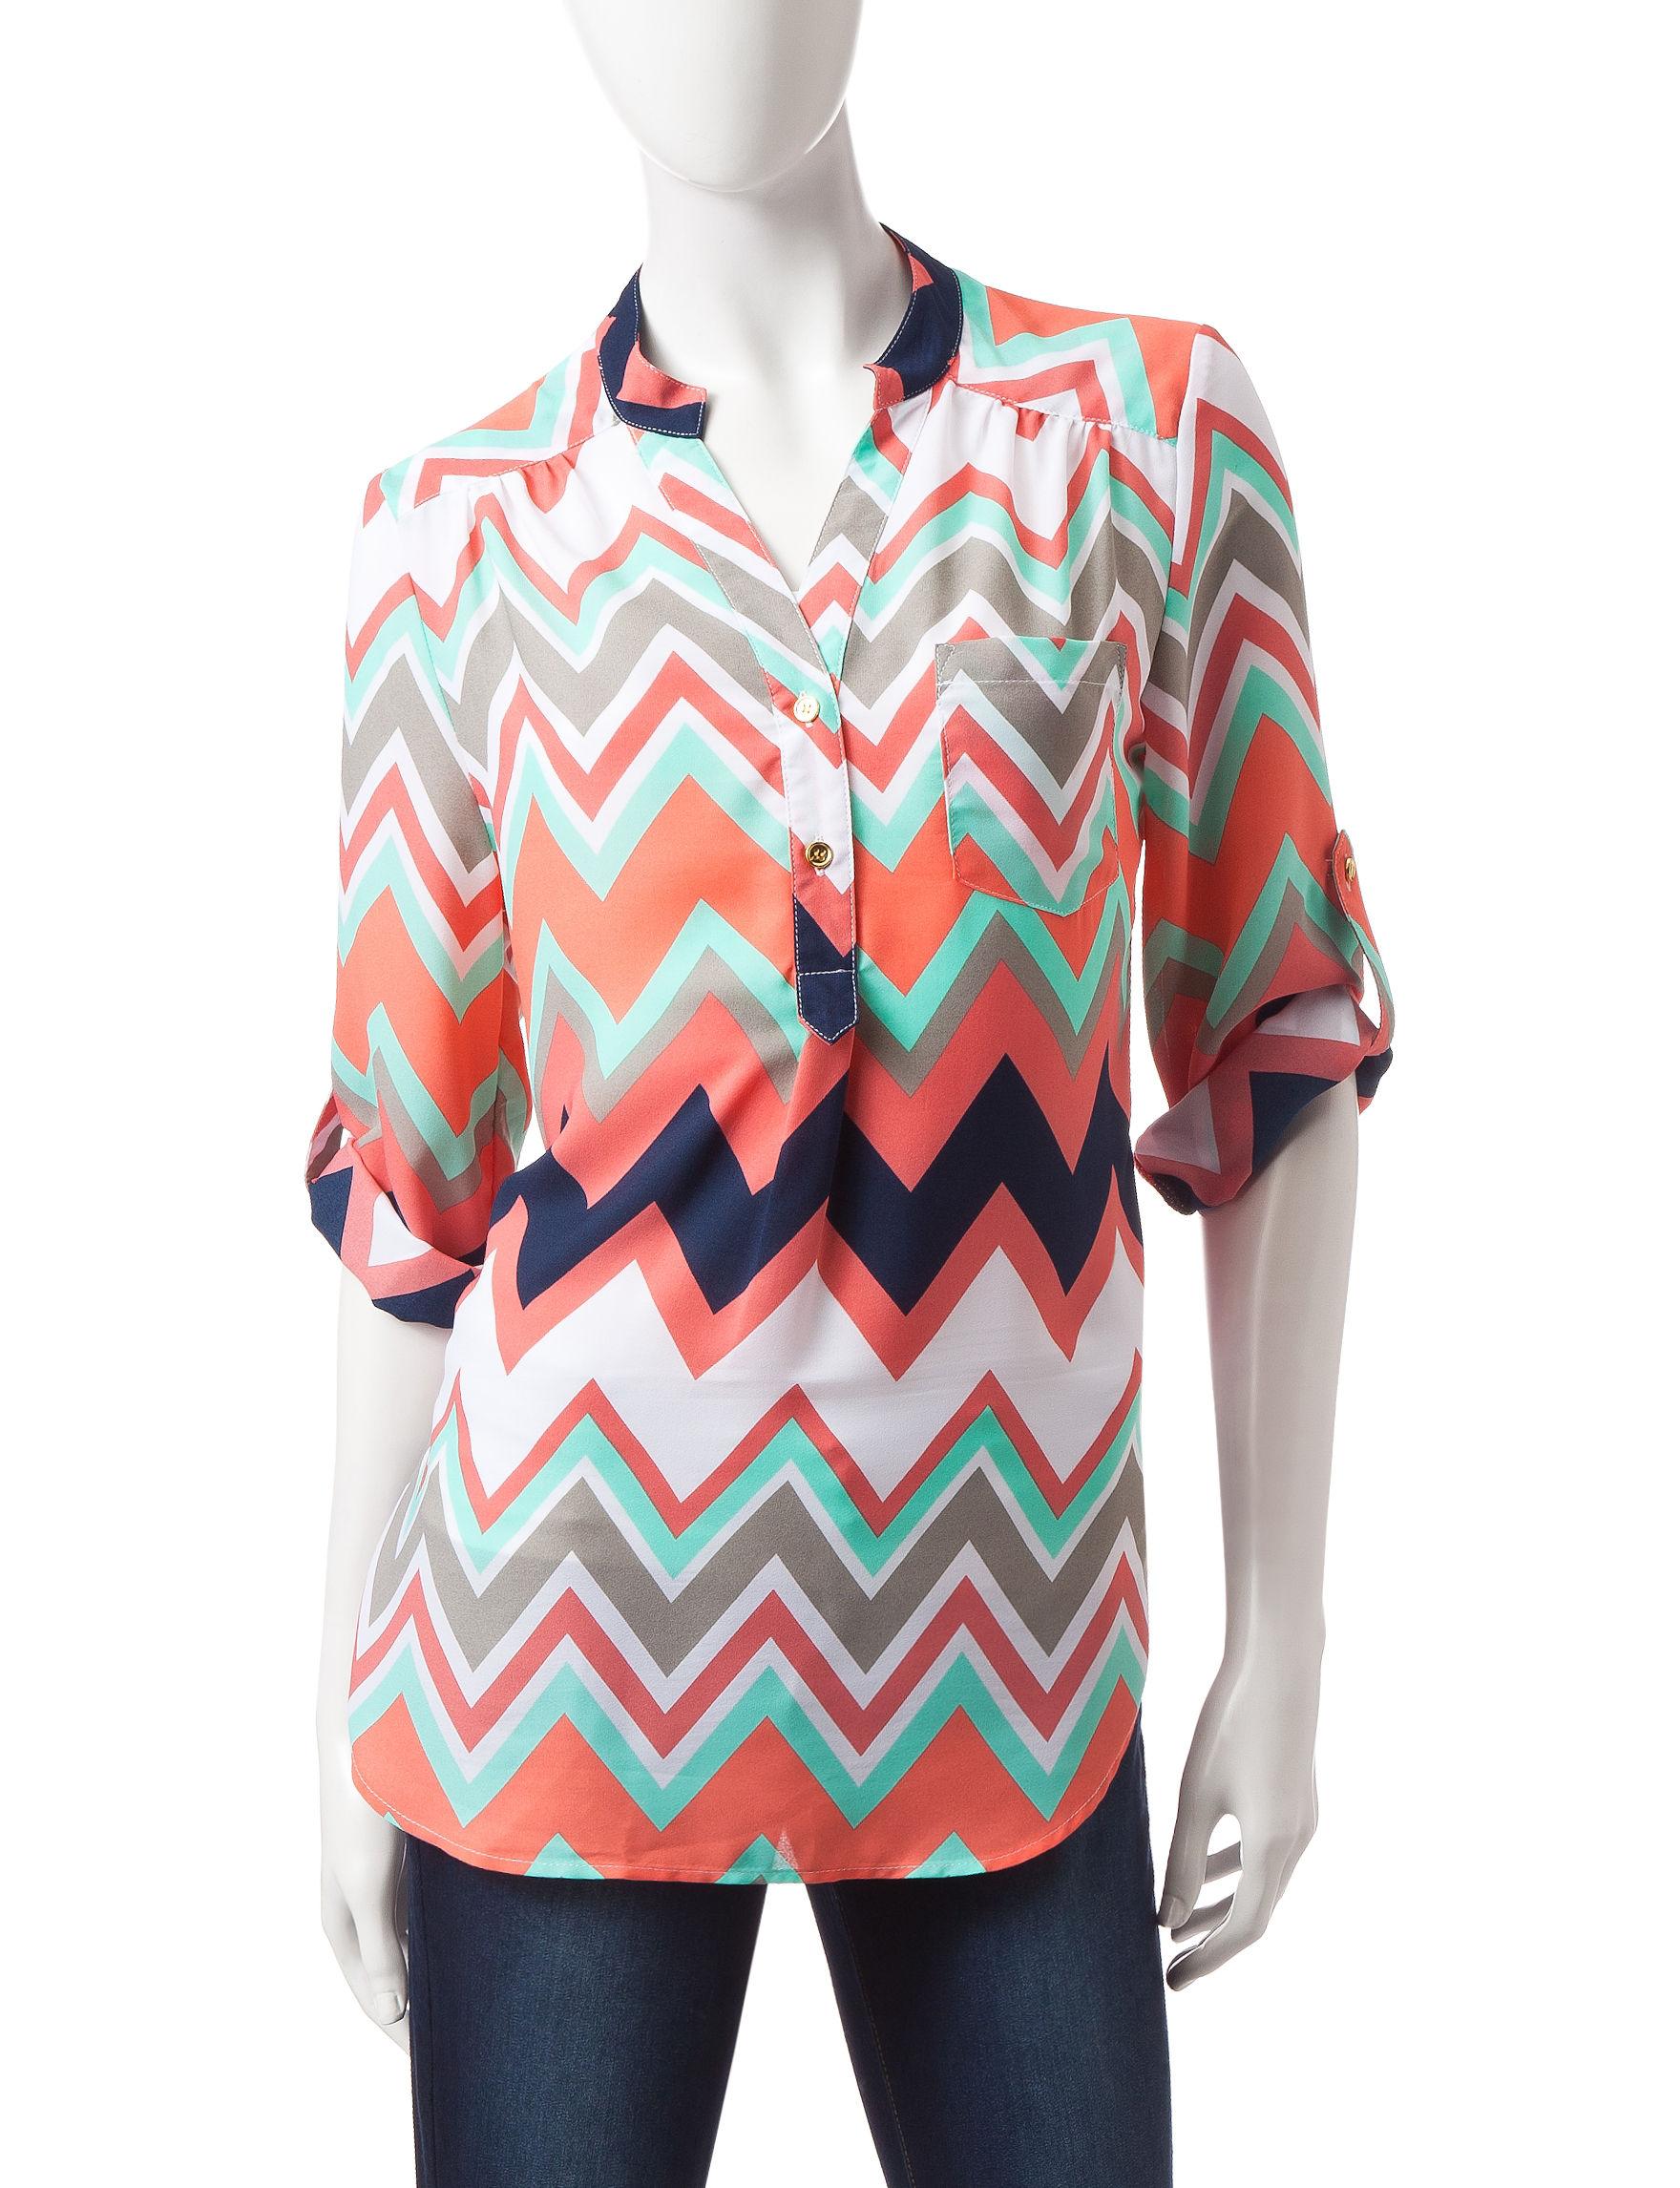 Wishful Park Coral Shirts & Blouses